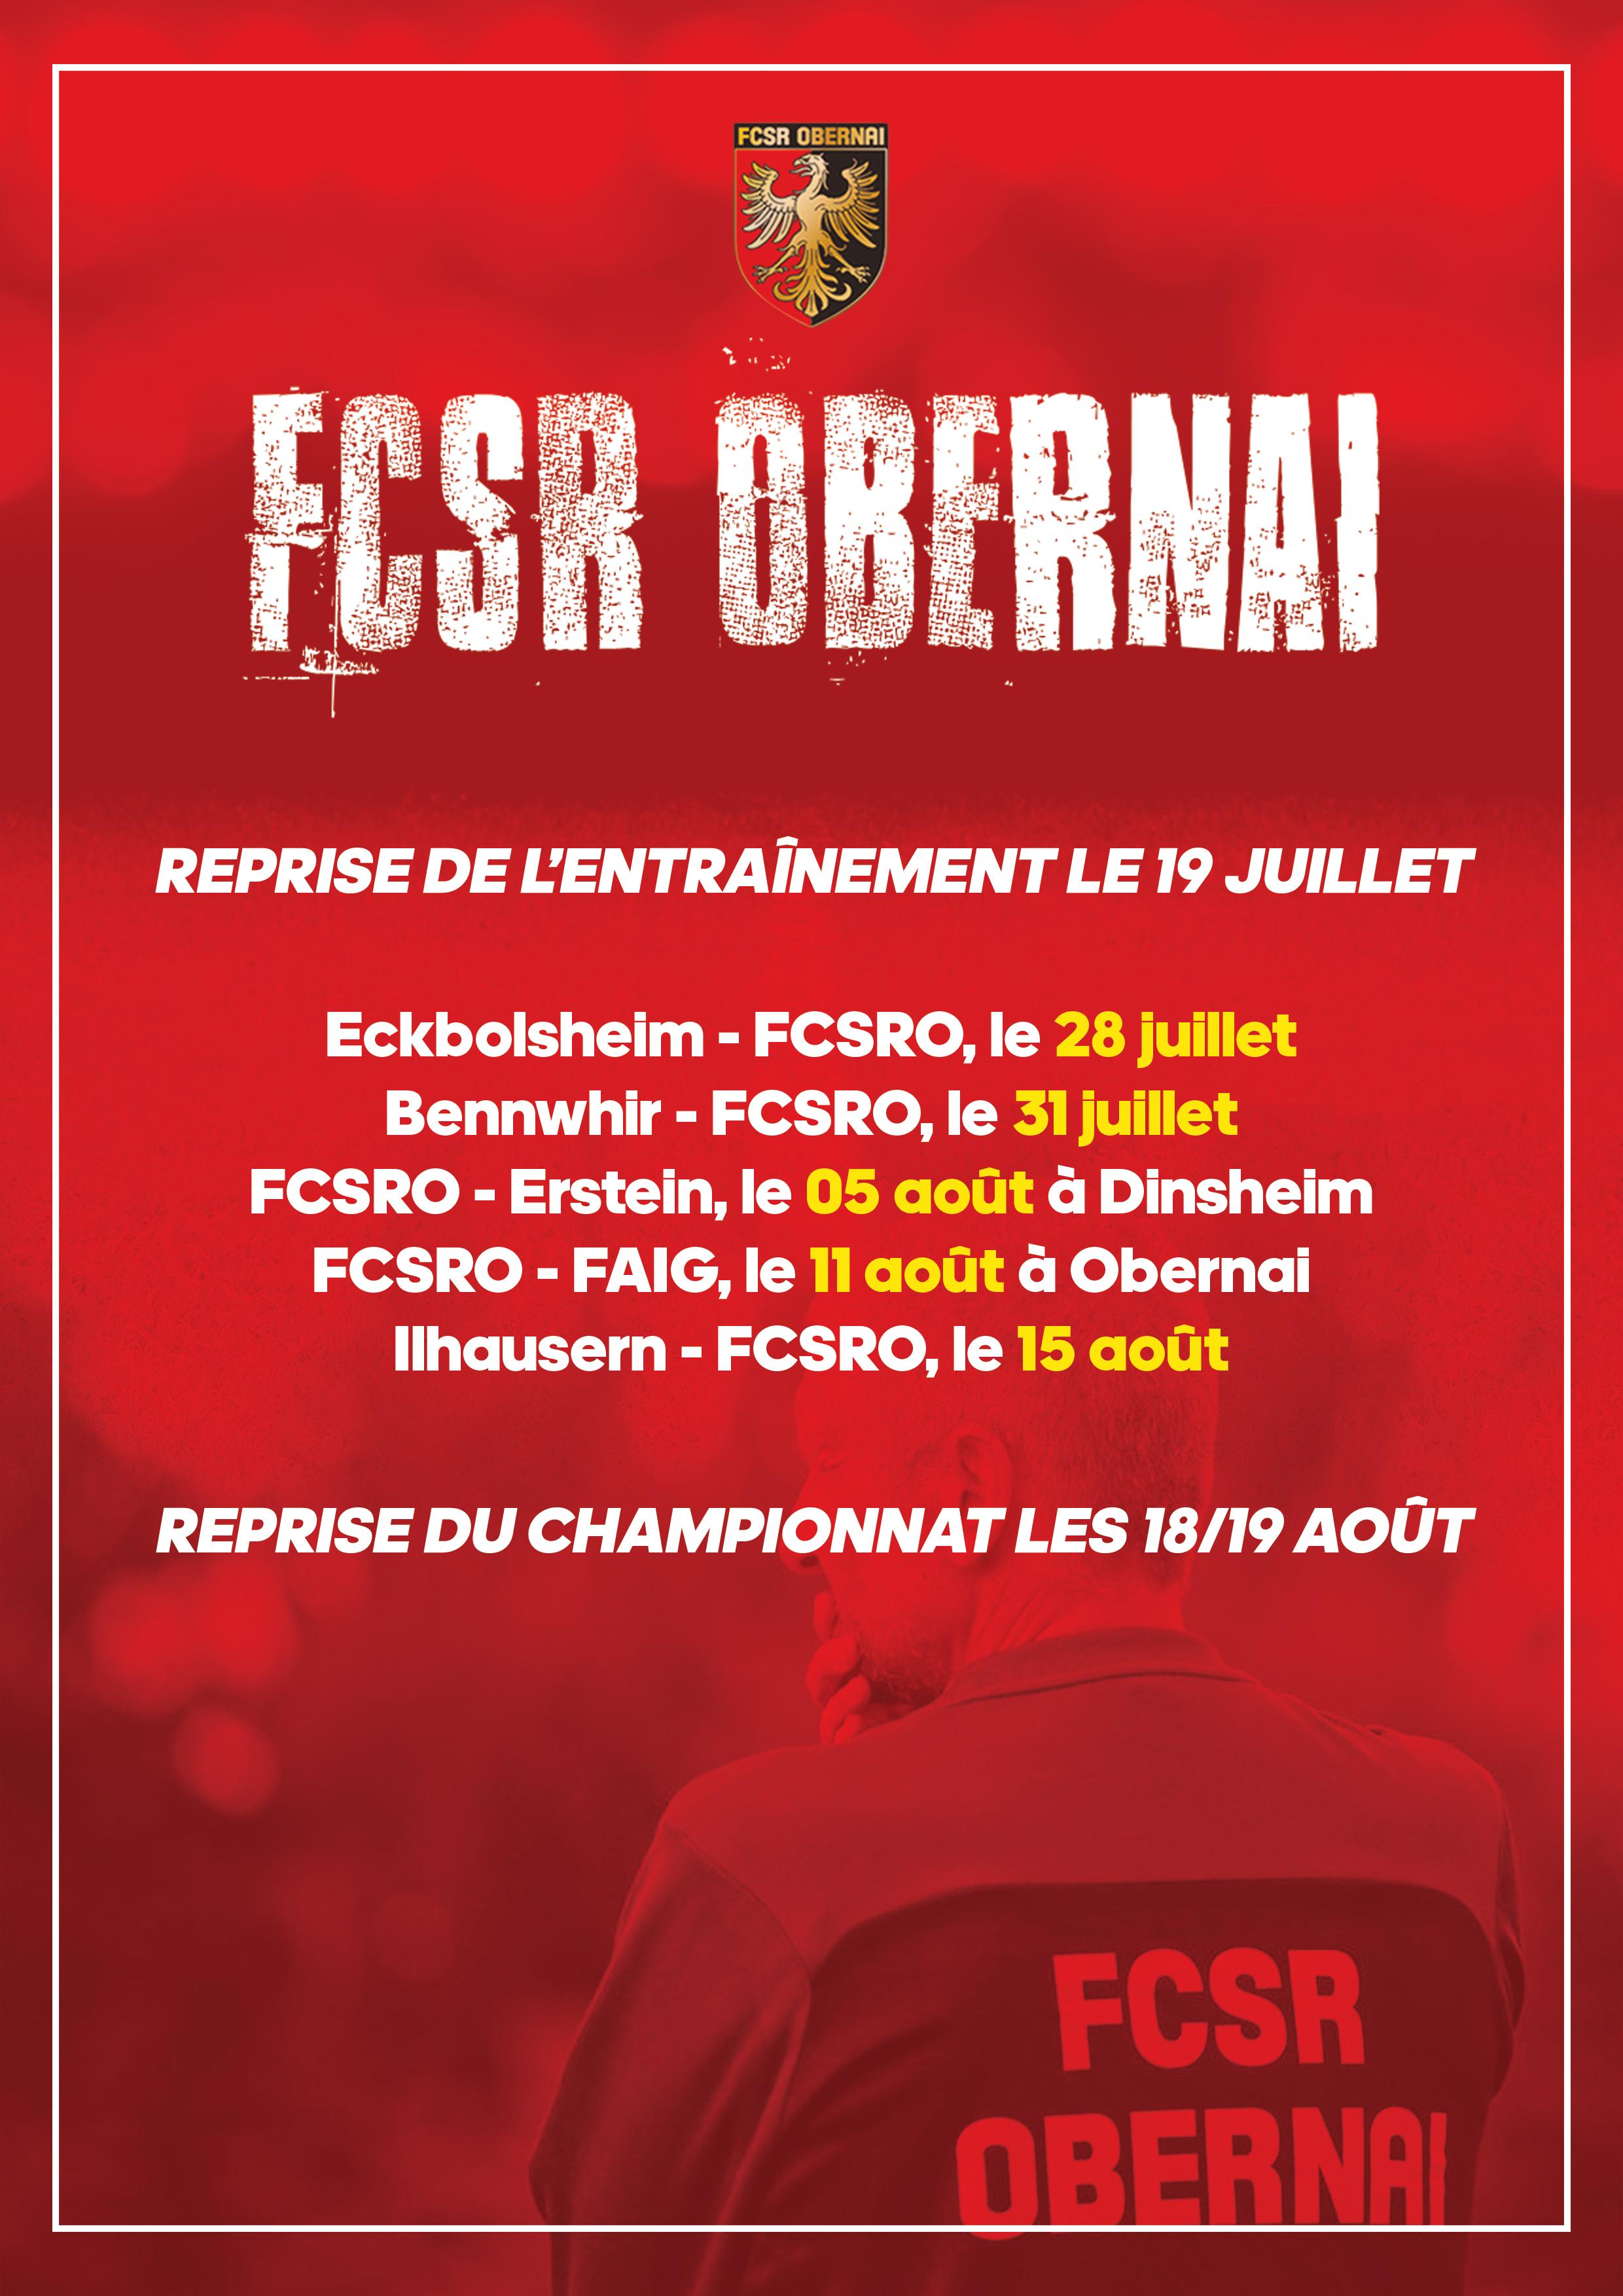 FCSR-Obernai 2.jpg